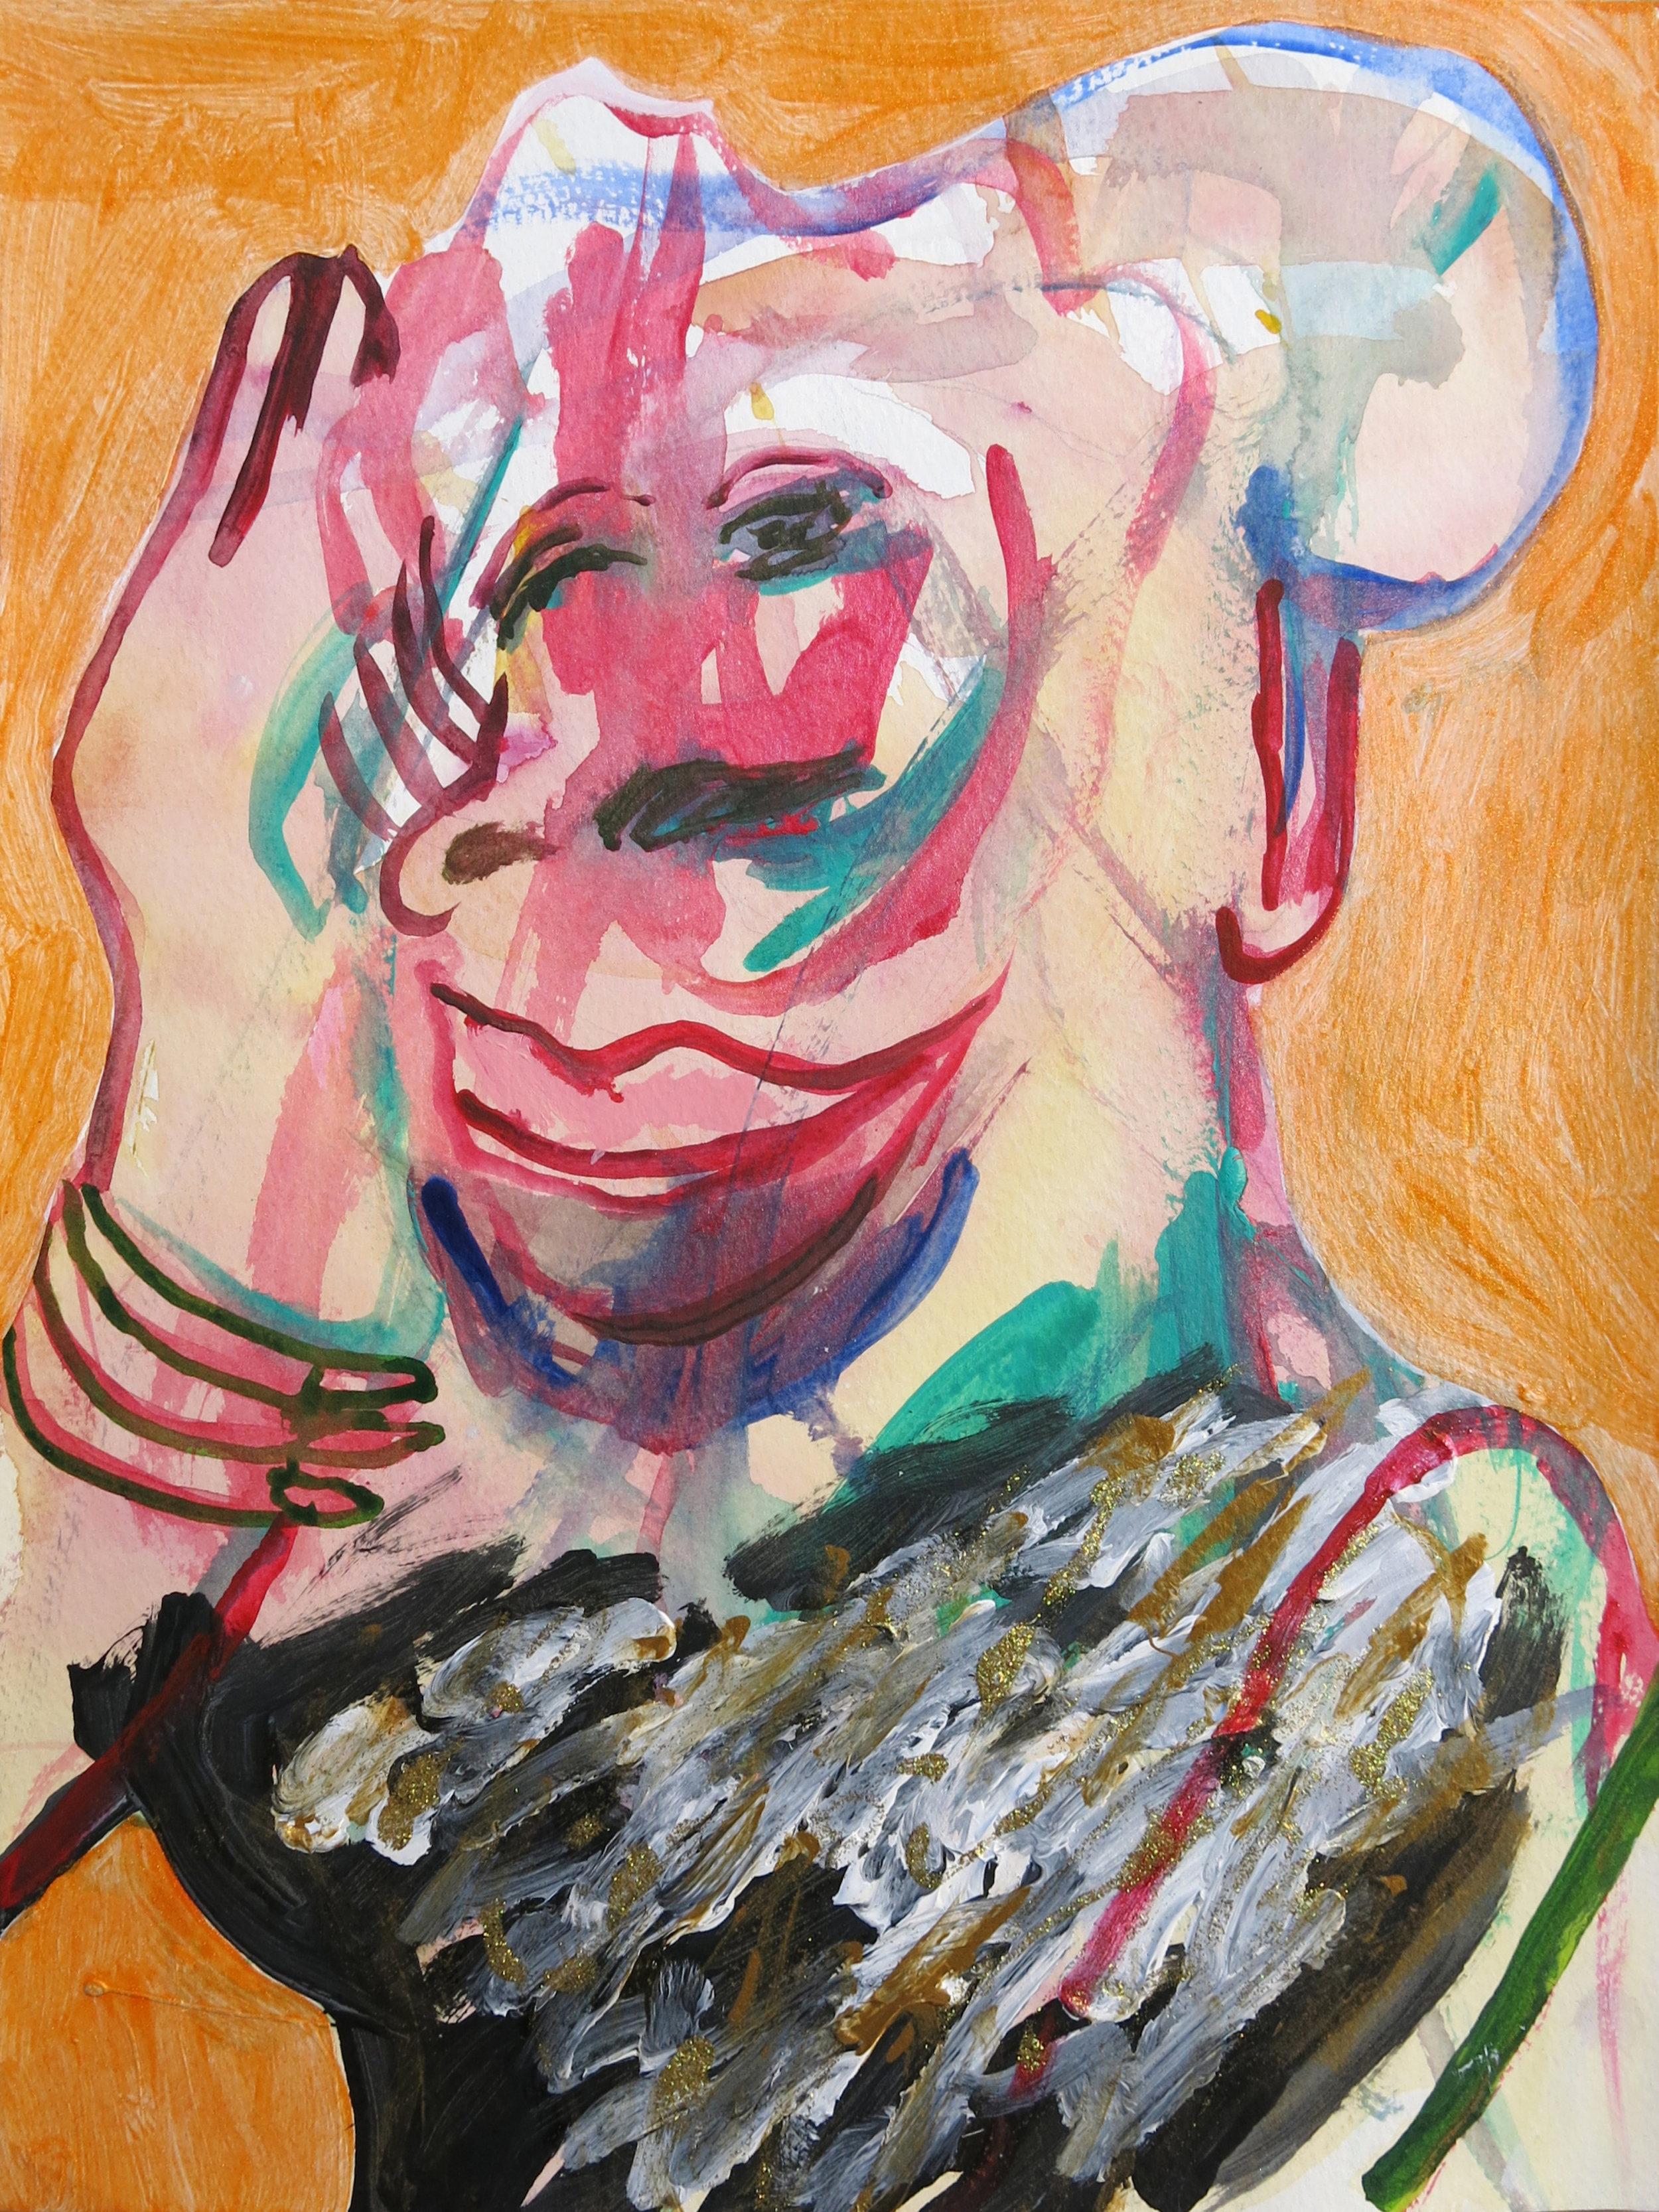 Barbra Streisand Portrait #123